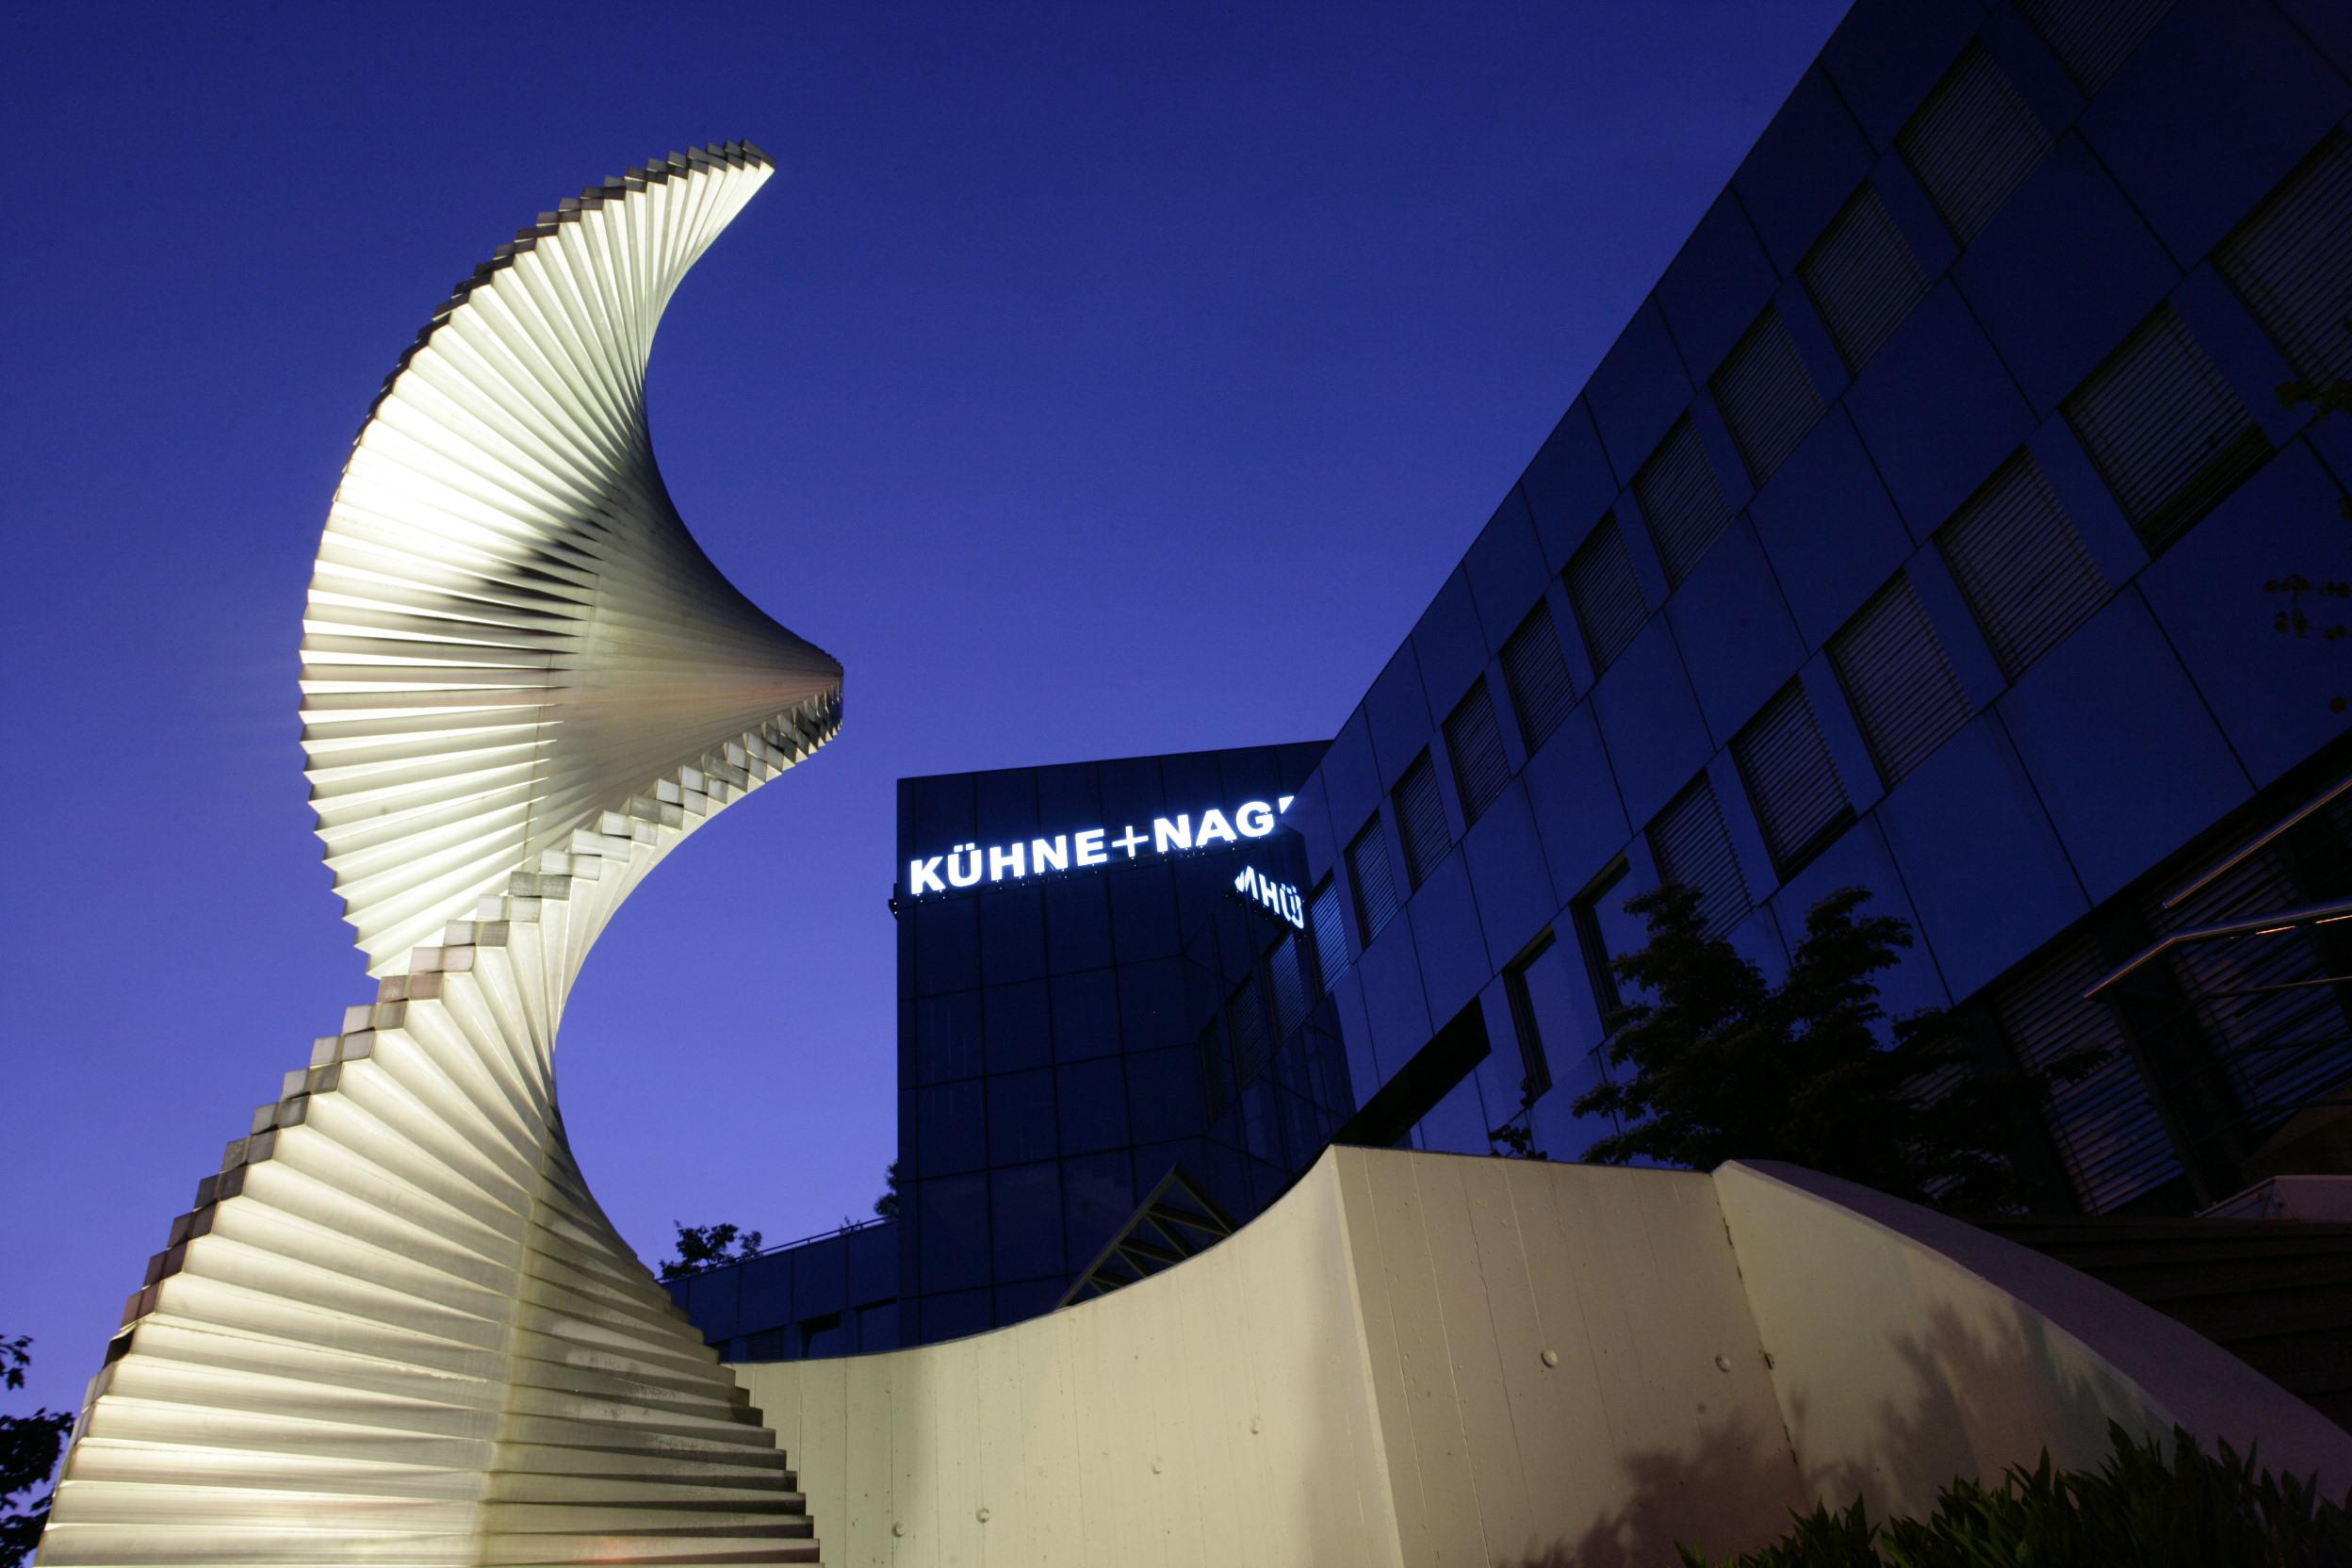 Kuehne + Nagel zet innovatiecentra op in Europa en Azië om digitale transformatie te versnellen